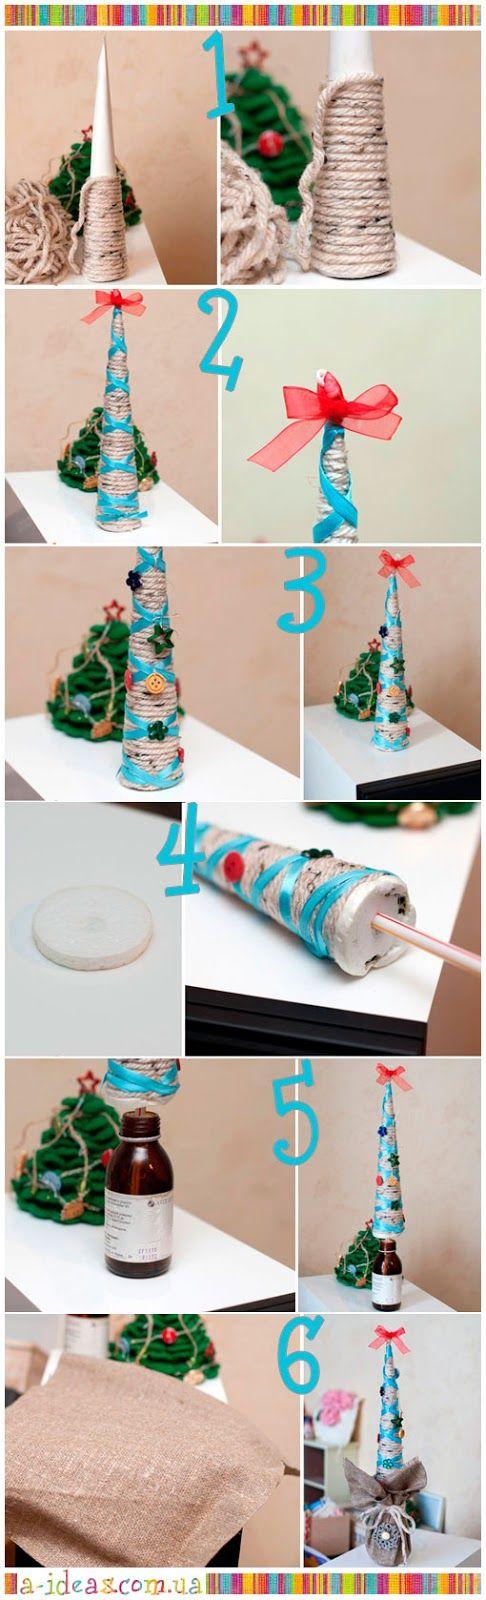 Handmade ideas: DIY: Christmas tree